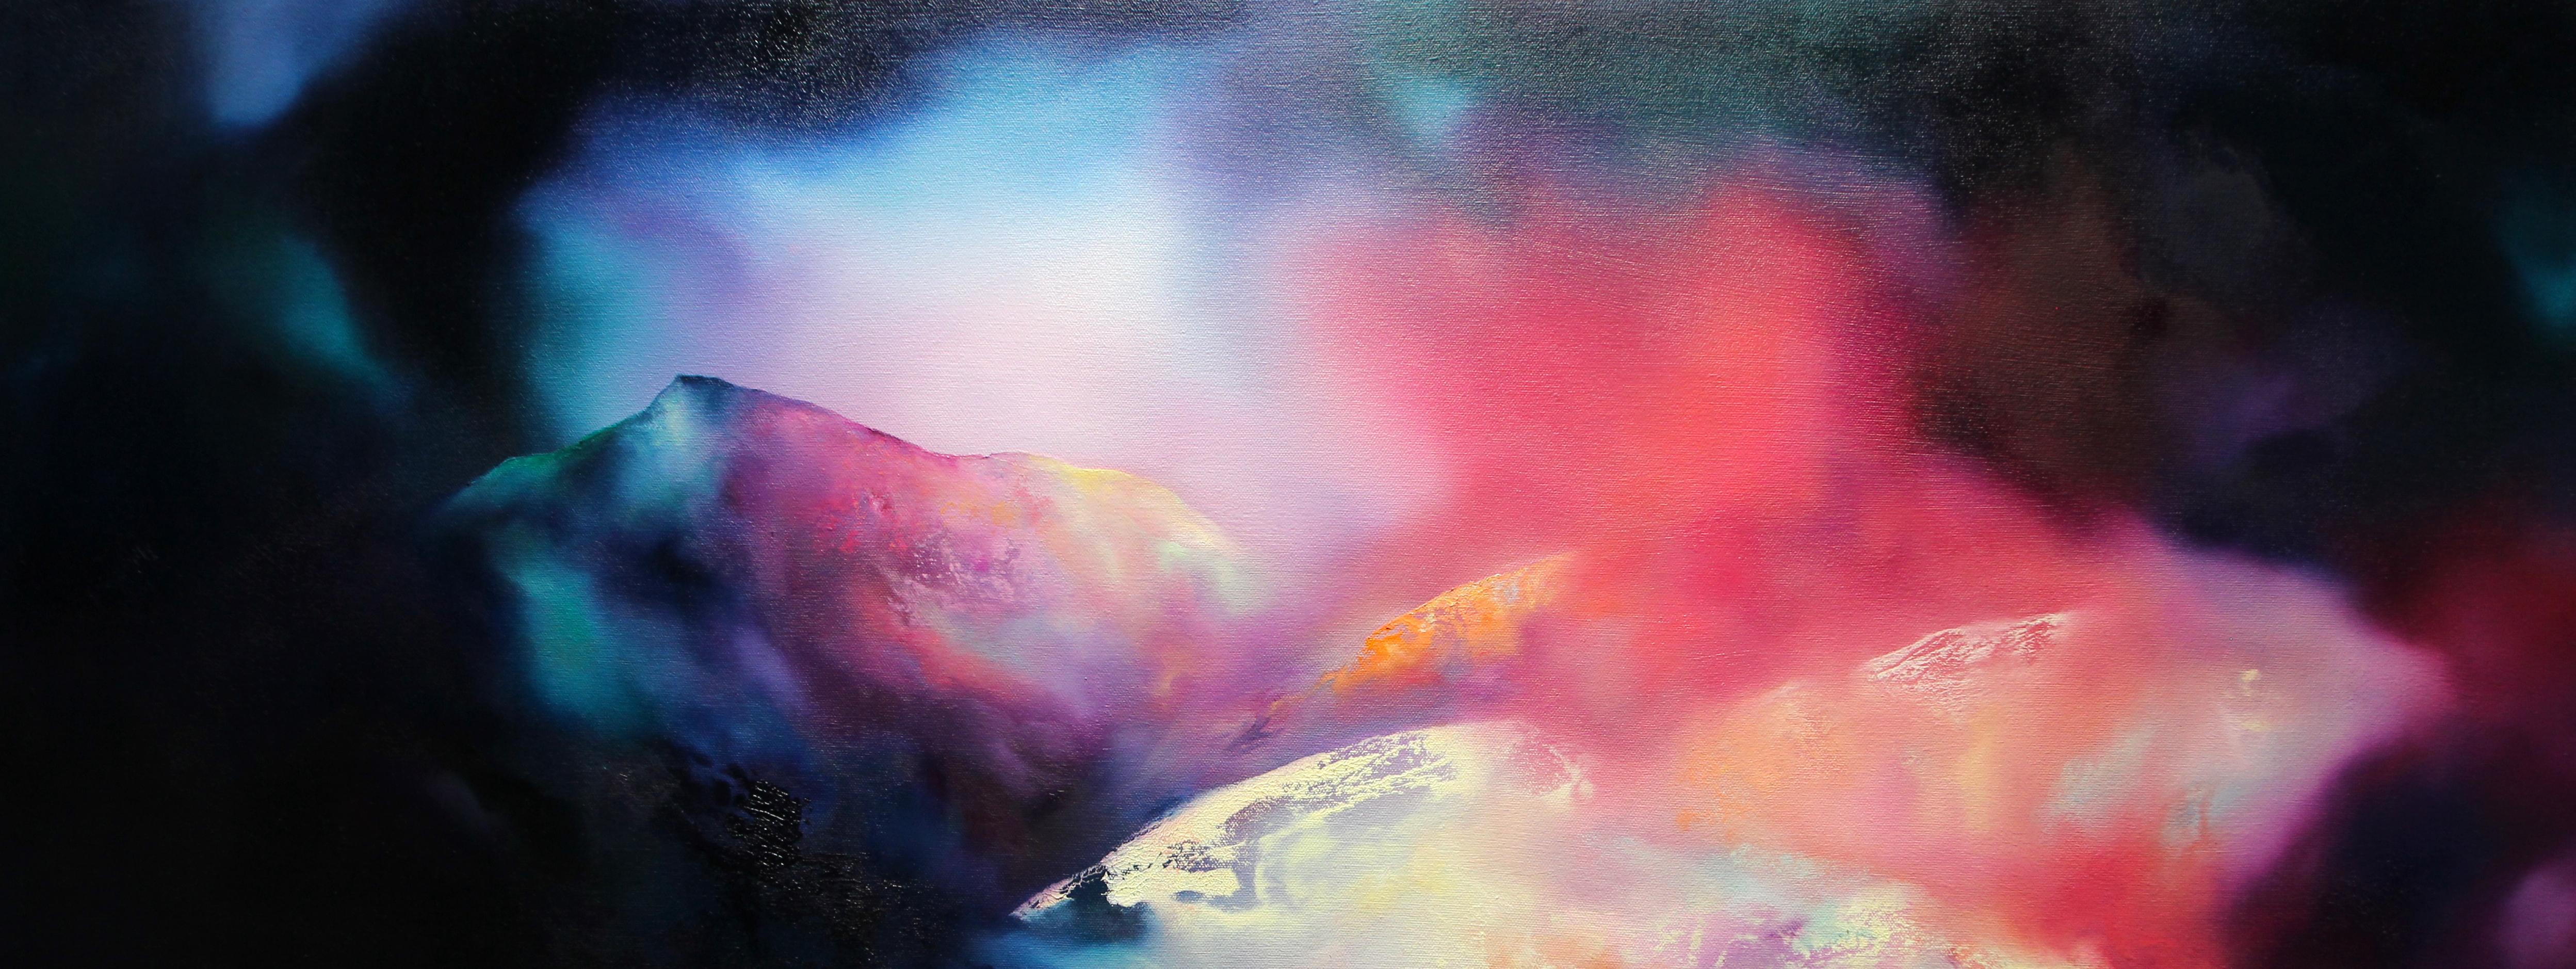 Cofio'r Wyddfa/Remembering Snowdonia 70 x 37cm